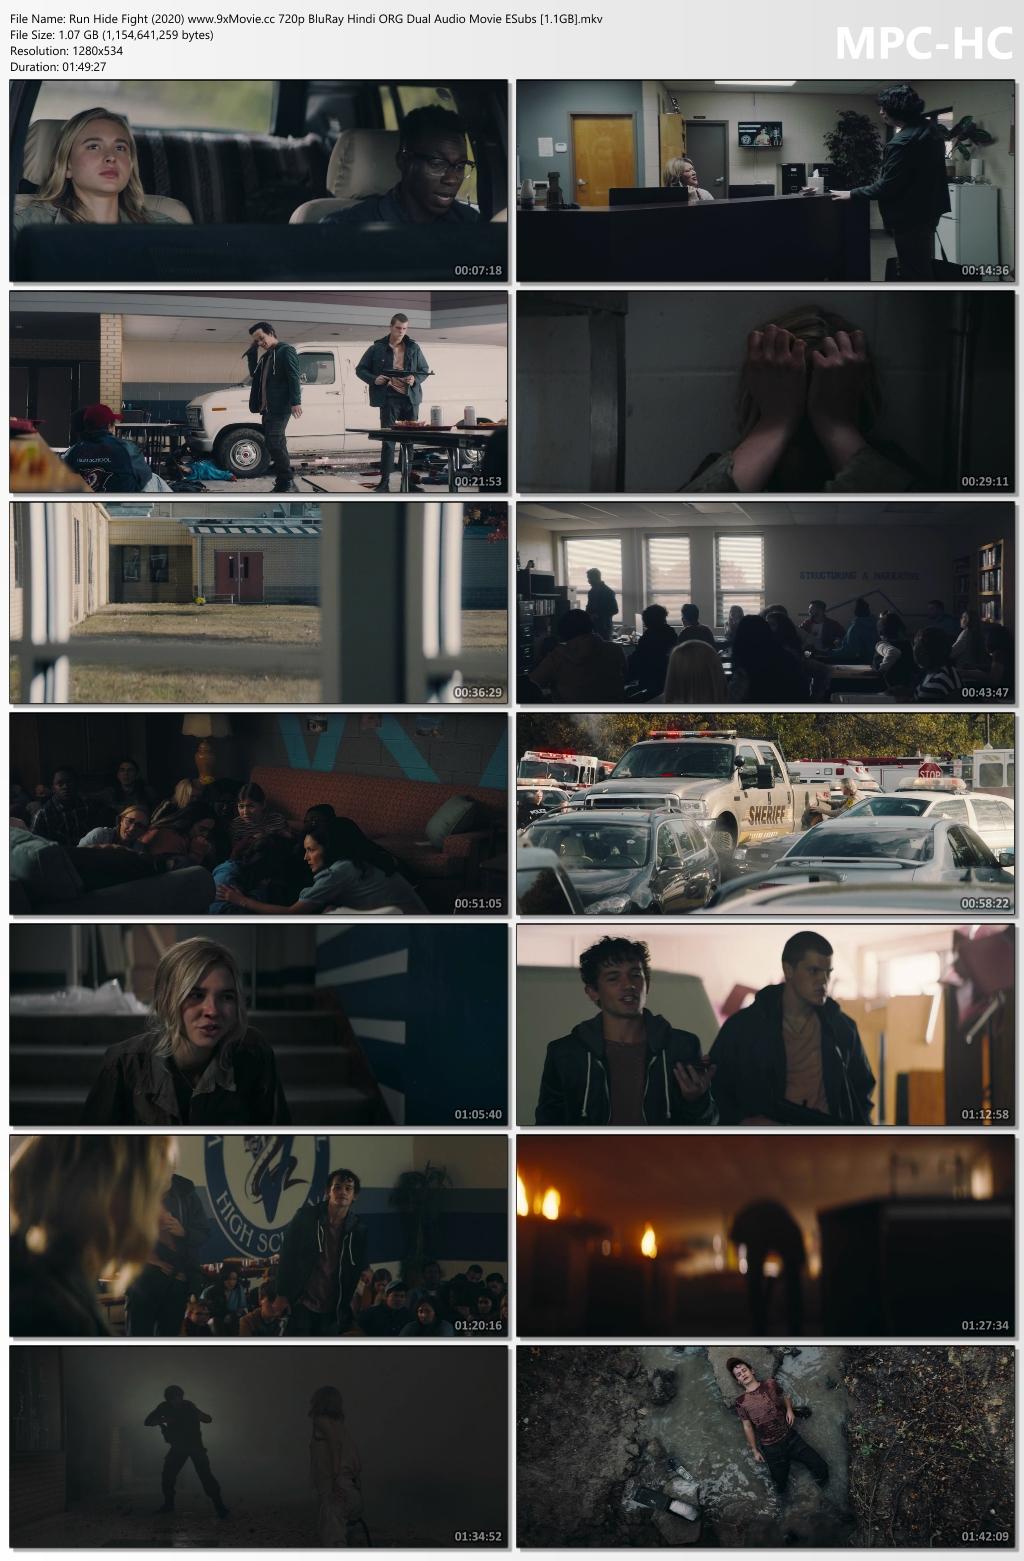 Run-Hide-Fight-2020-www-9x-Movie-cc-720p-Blu-Ray-Hindi-ORG-Dual-Audio-Movie-ESubs-1-1-GB-mkv